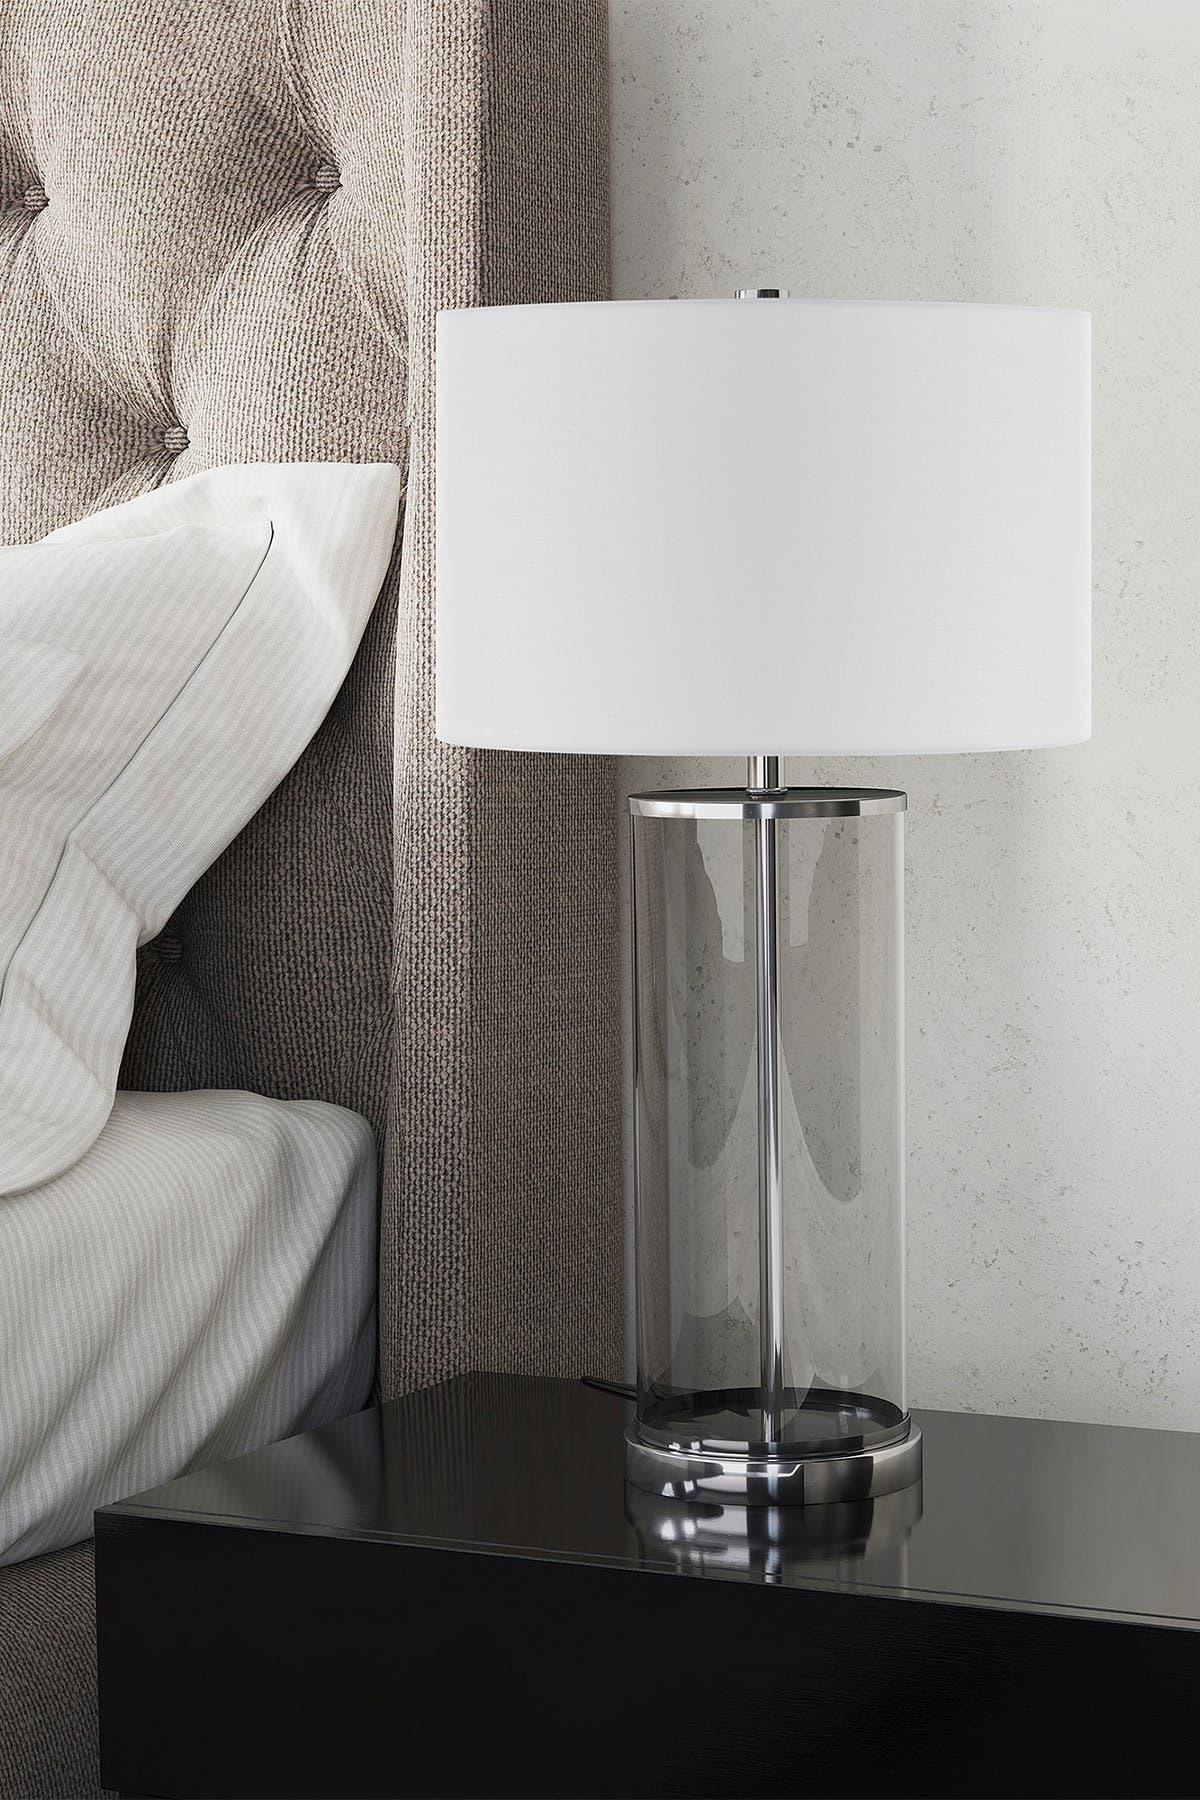 Image of Addison and Lane Rowan Table Lamp     Glass/Nickel